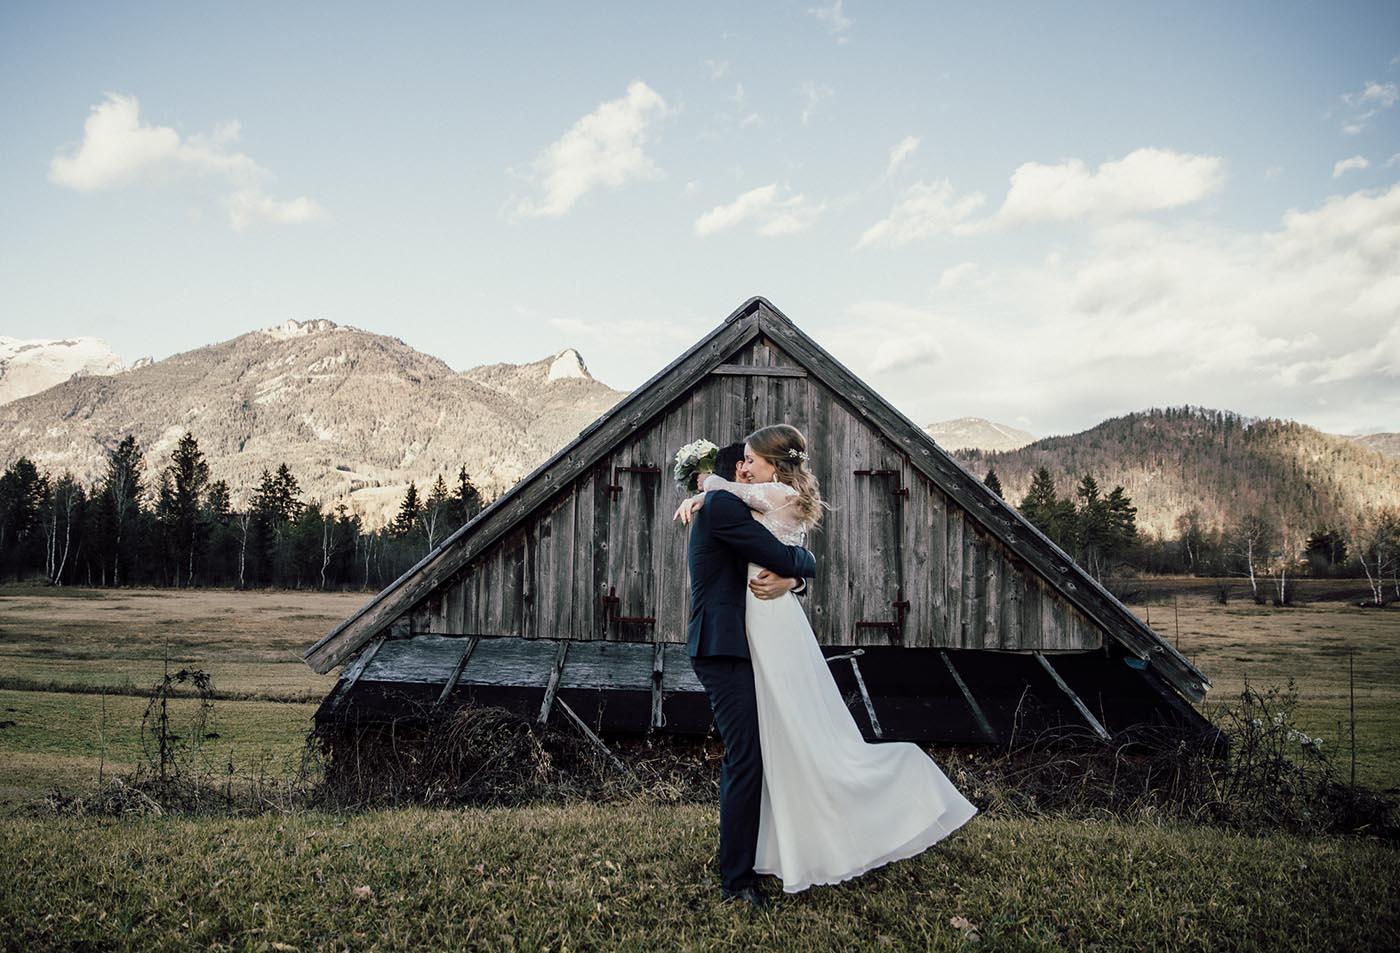 Hochzeitsfotograf & Videograf Lukas Prudky